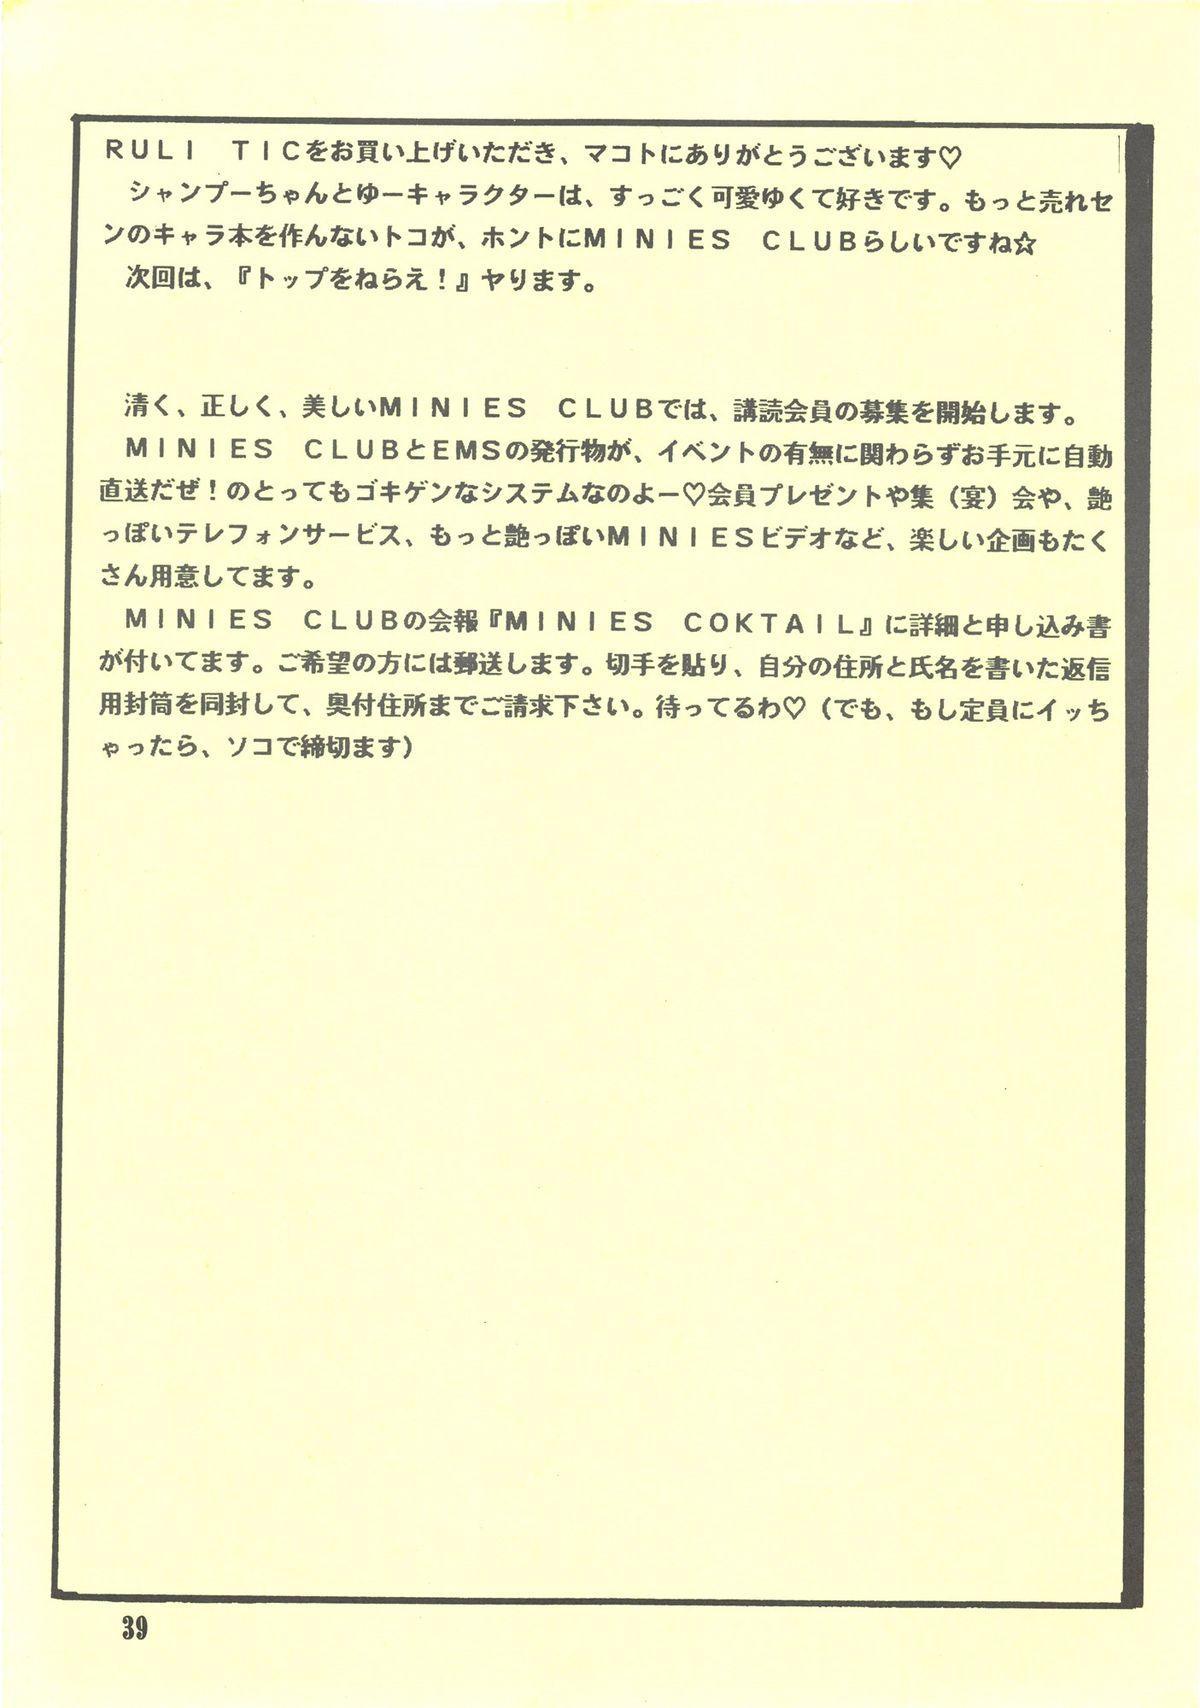 RULI TIC 38